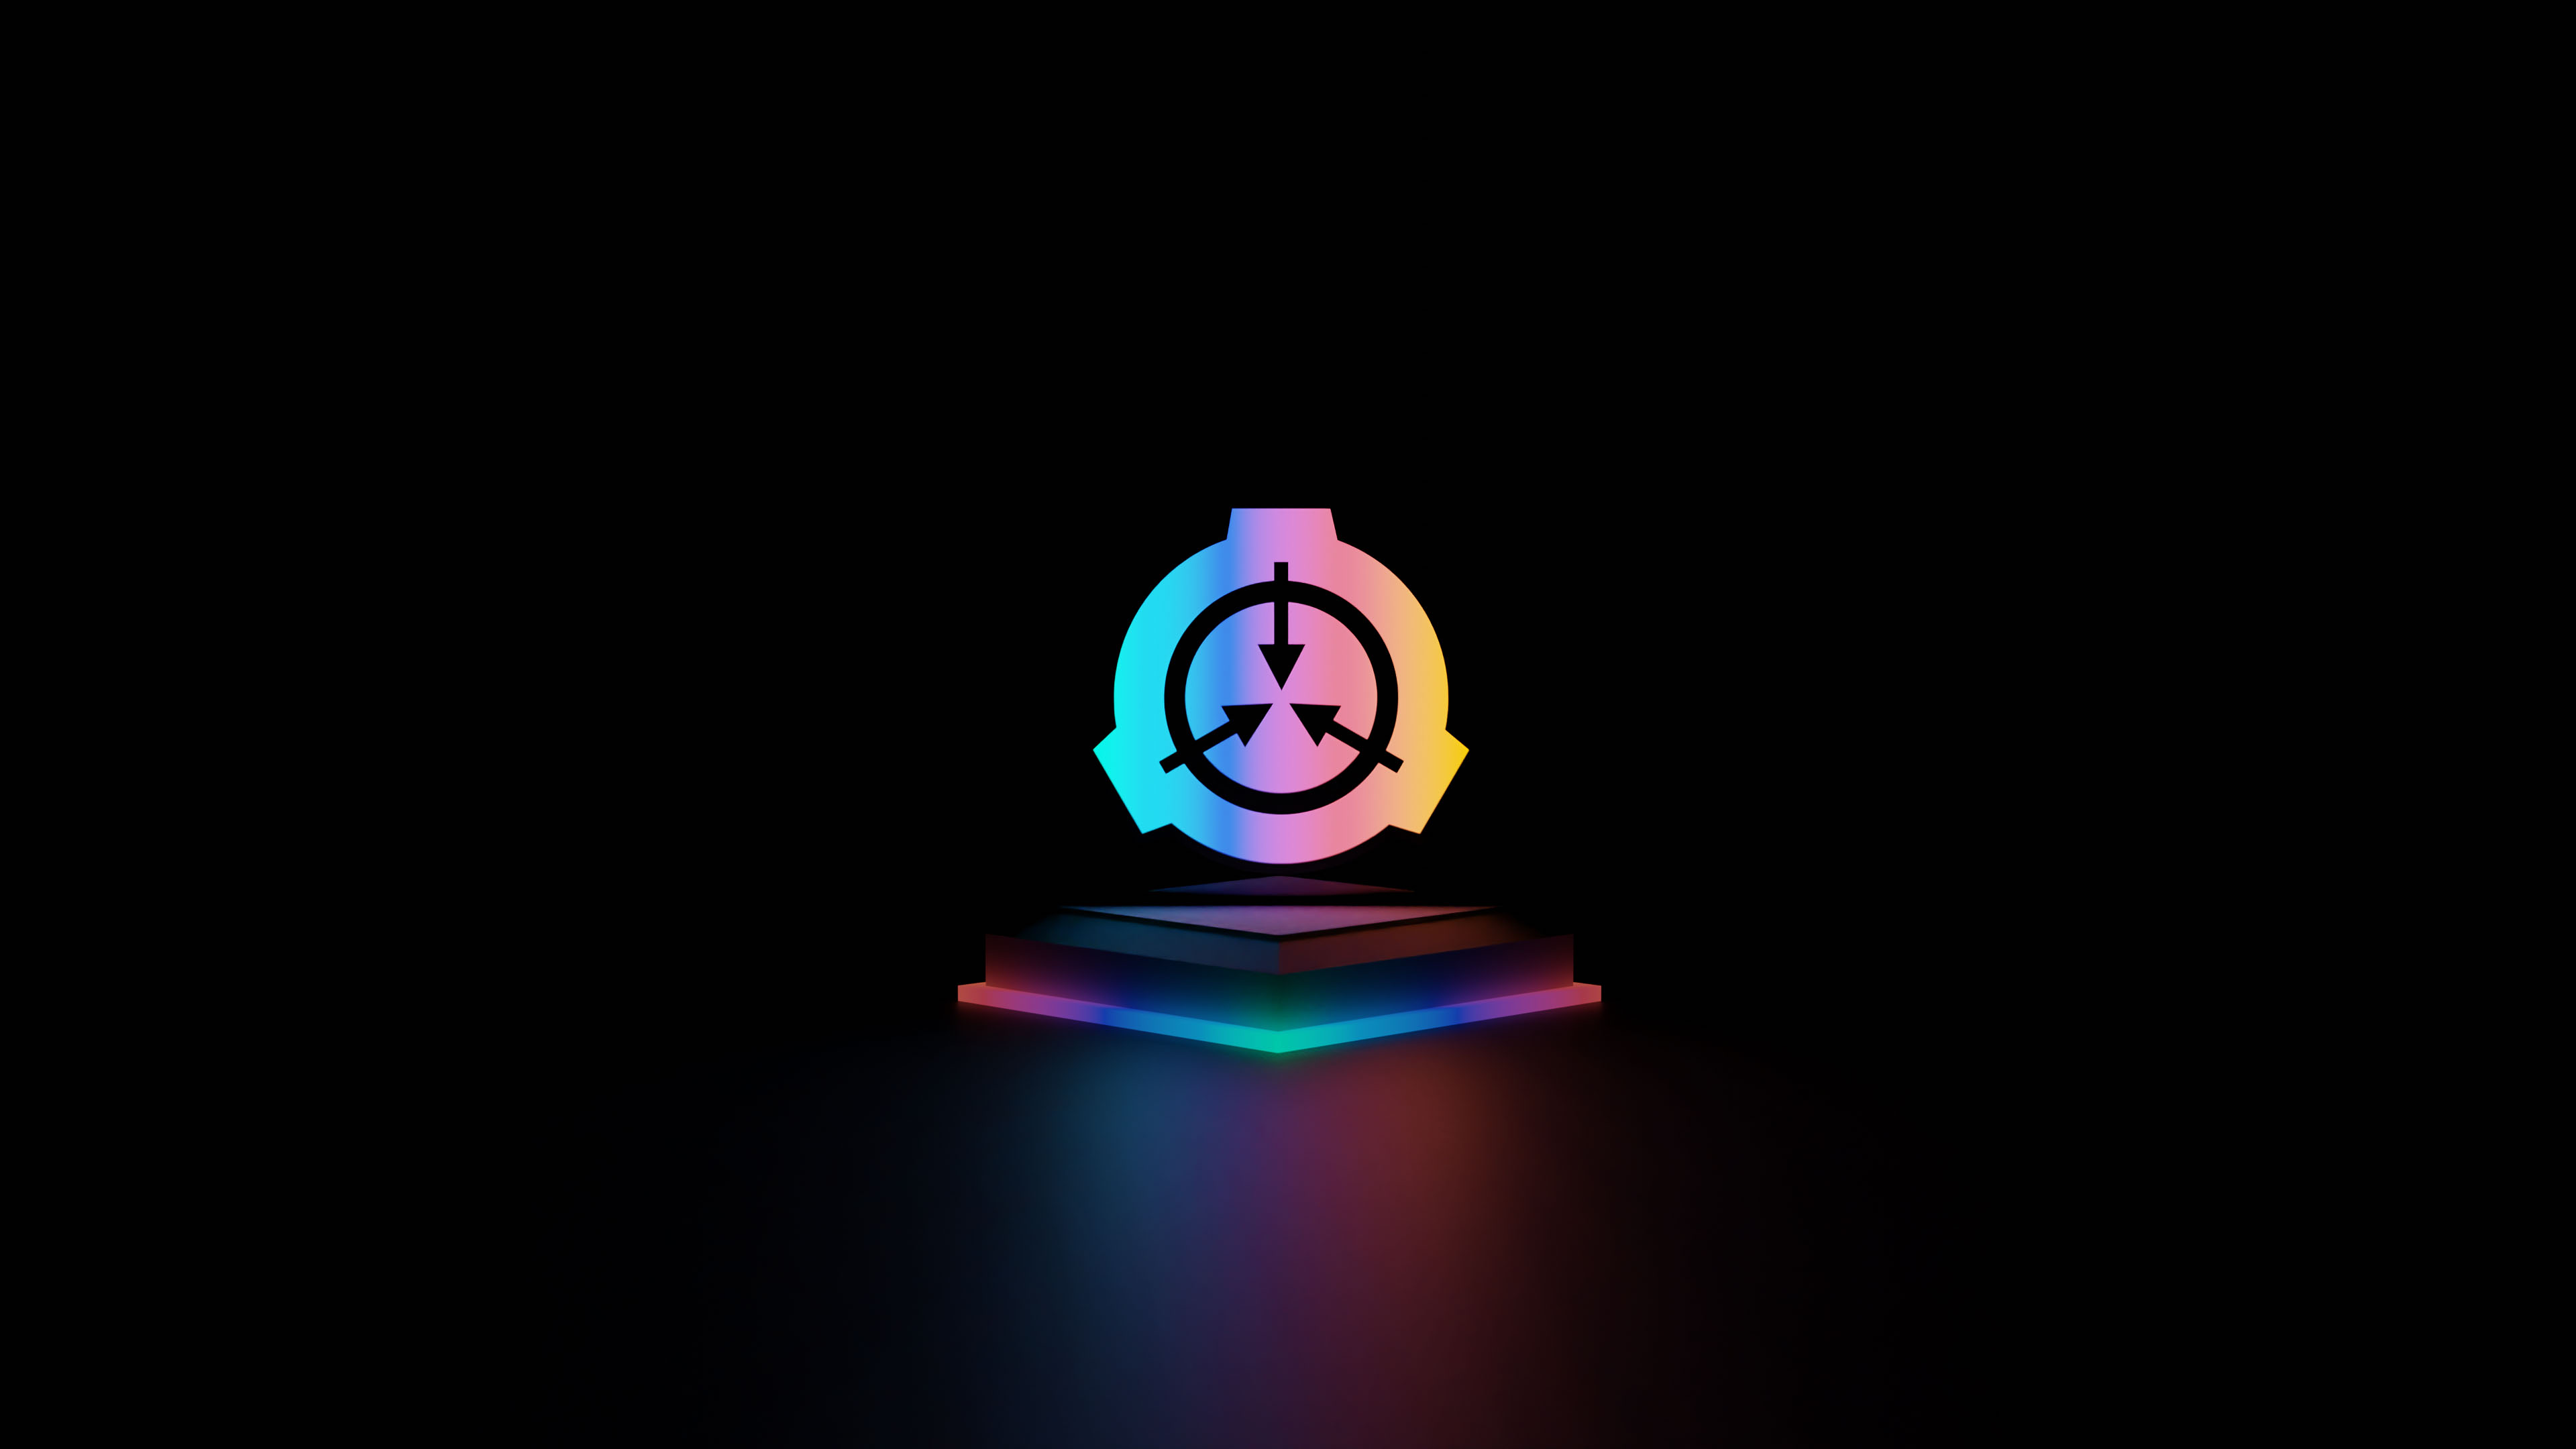 Neon%20Multi%20color%20podium.jpg